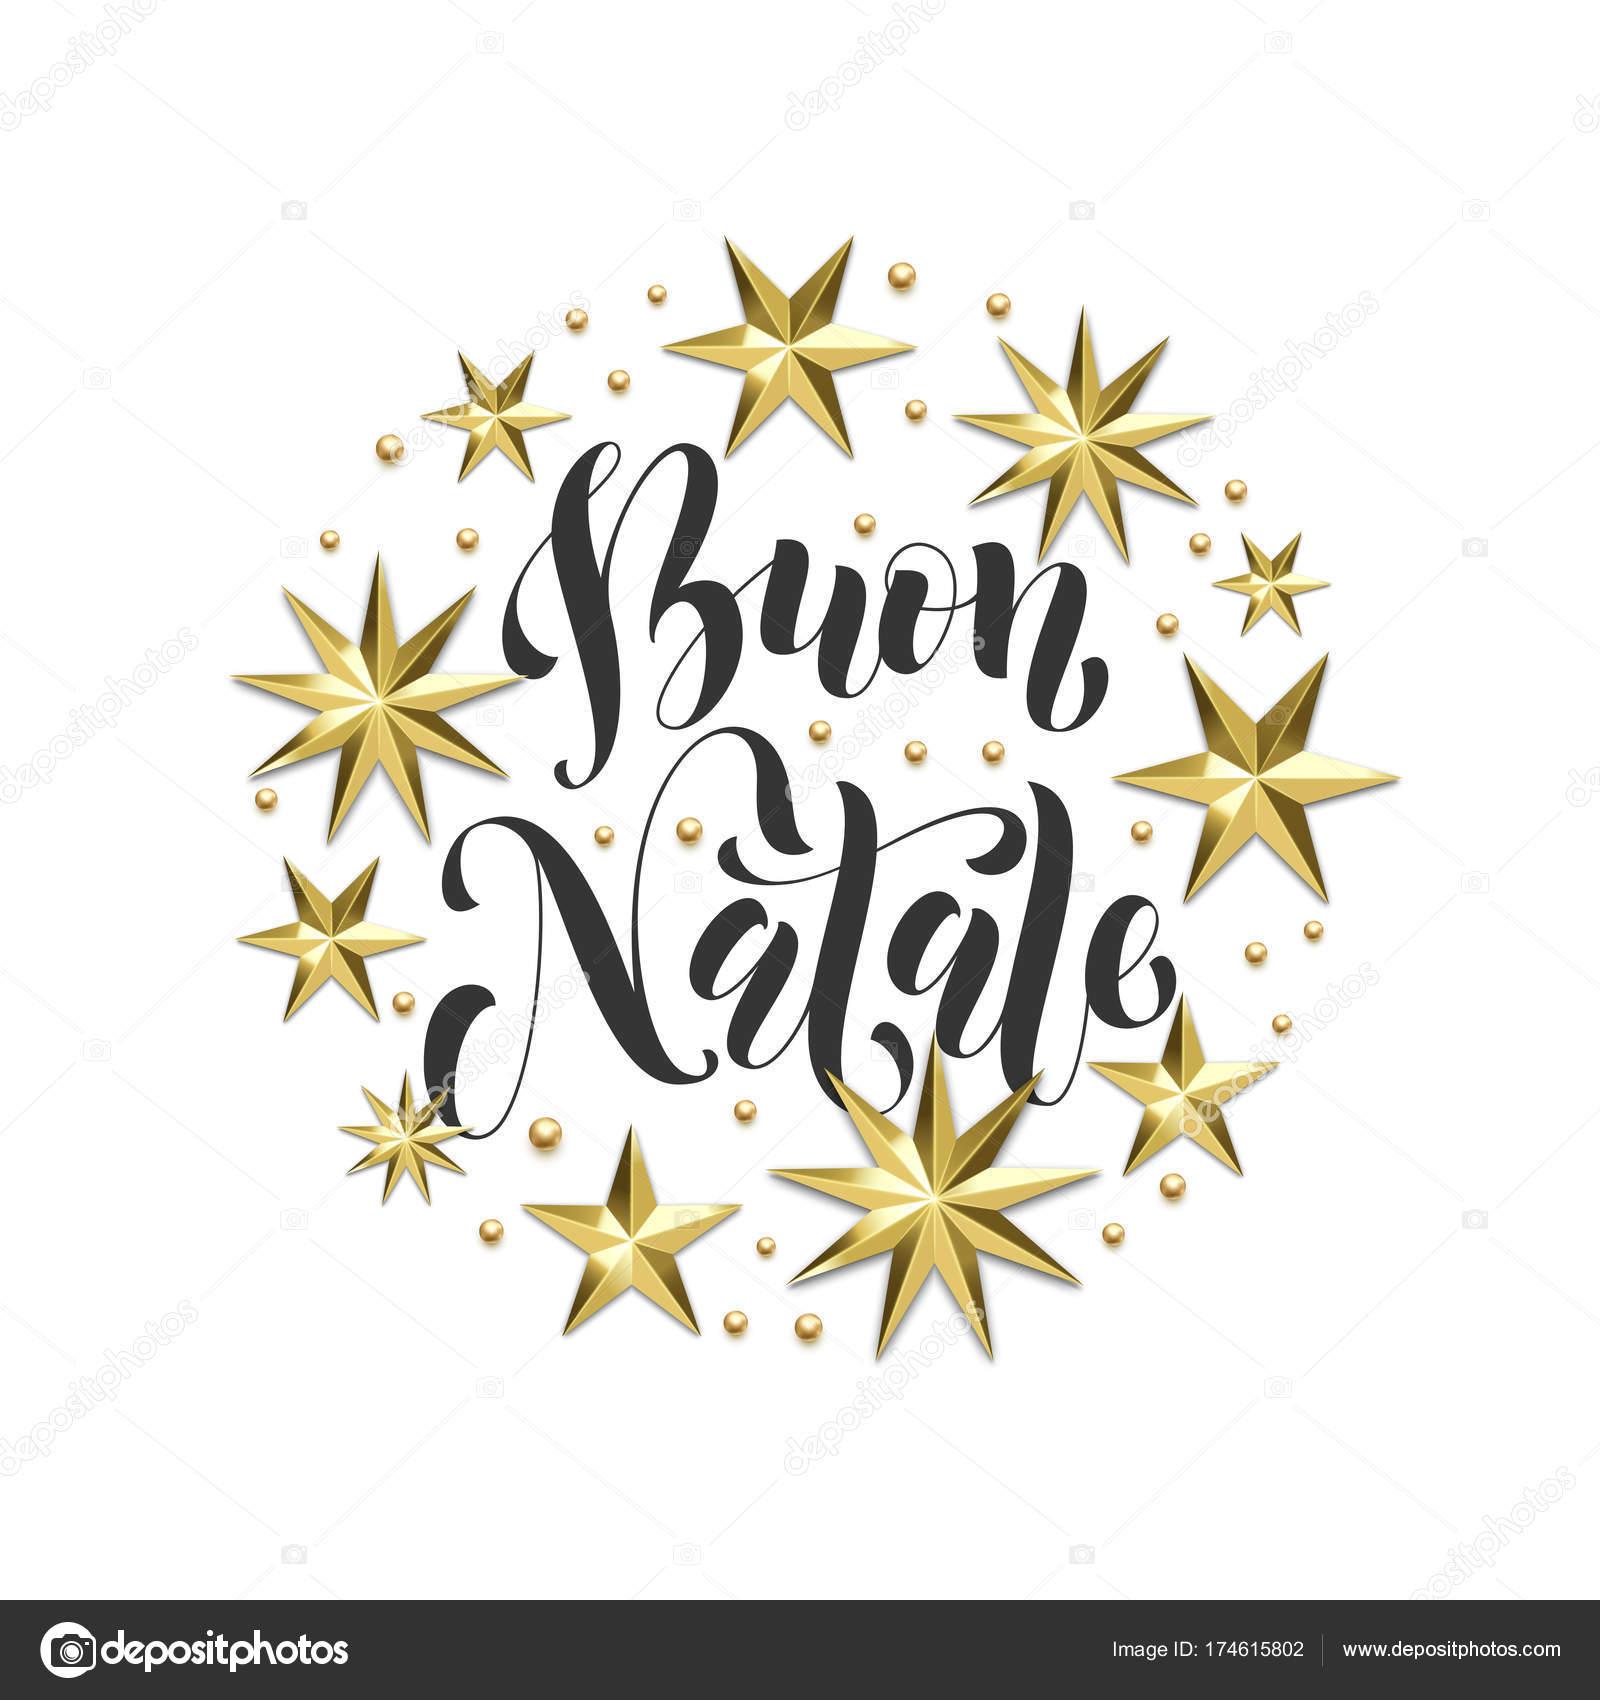 Buon natale italian merry christmas golden decoration calligraphy buon natale italian merry christmas golden decoration calligraphy font for xmas greeting card or invitation m4hsunfo